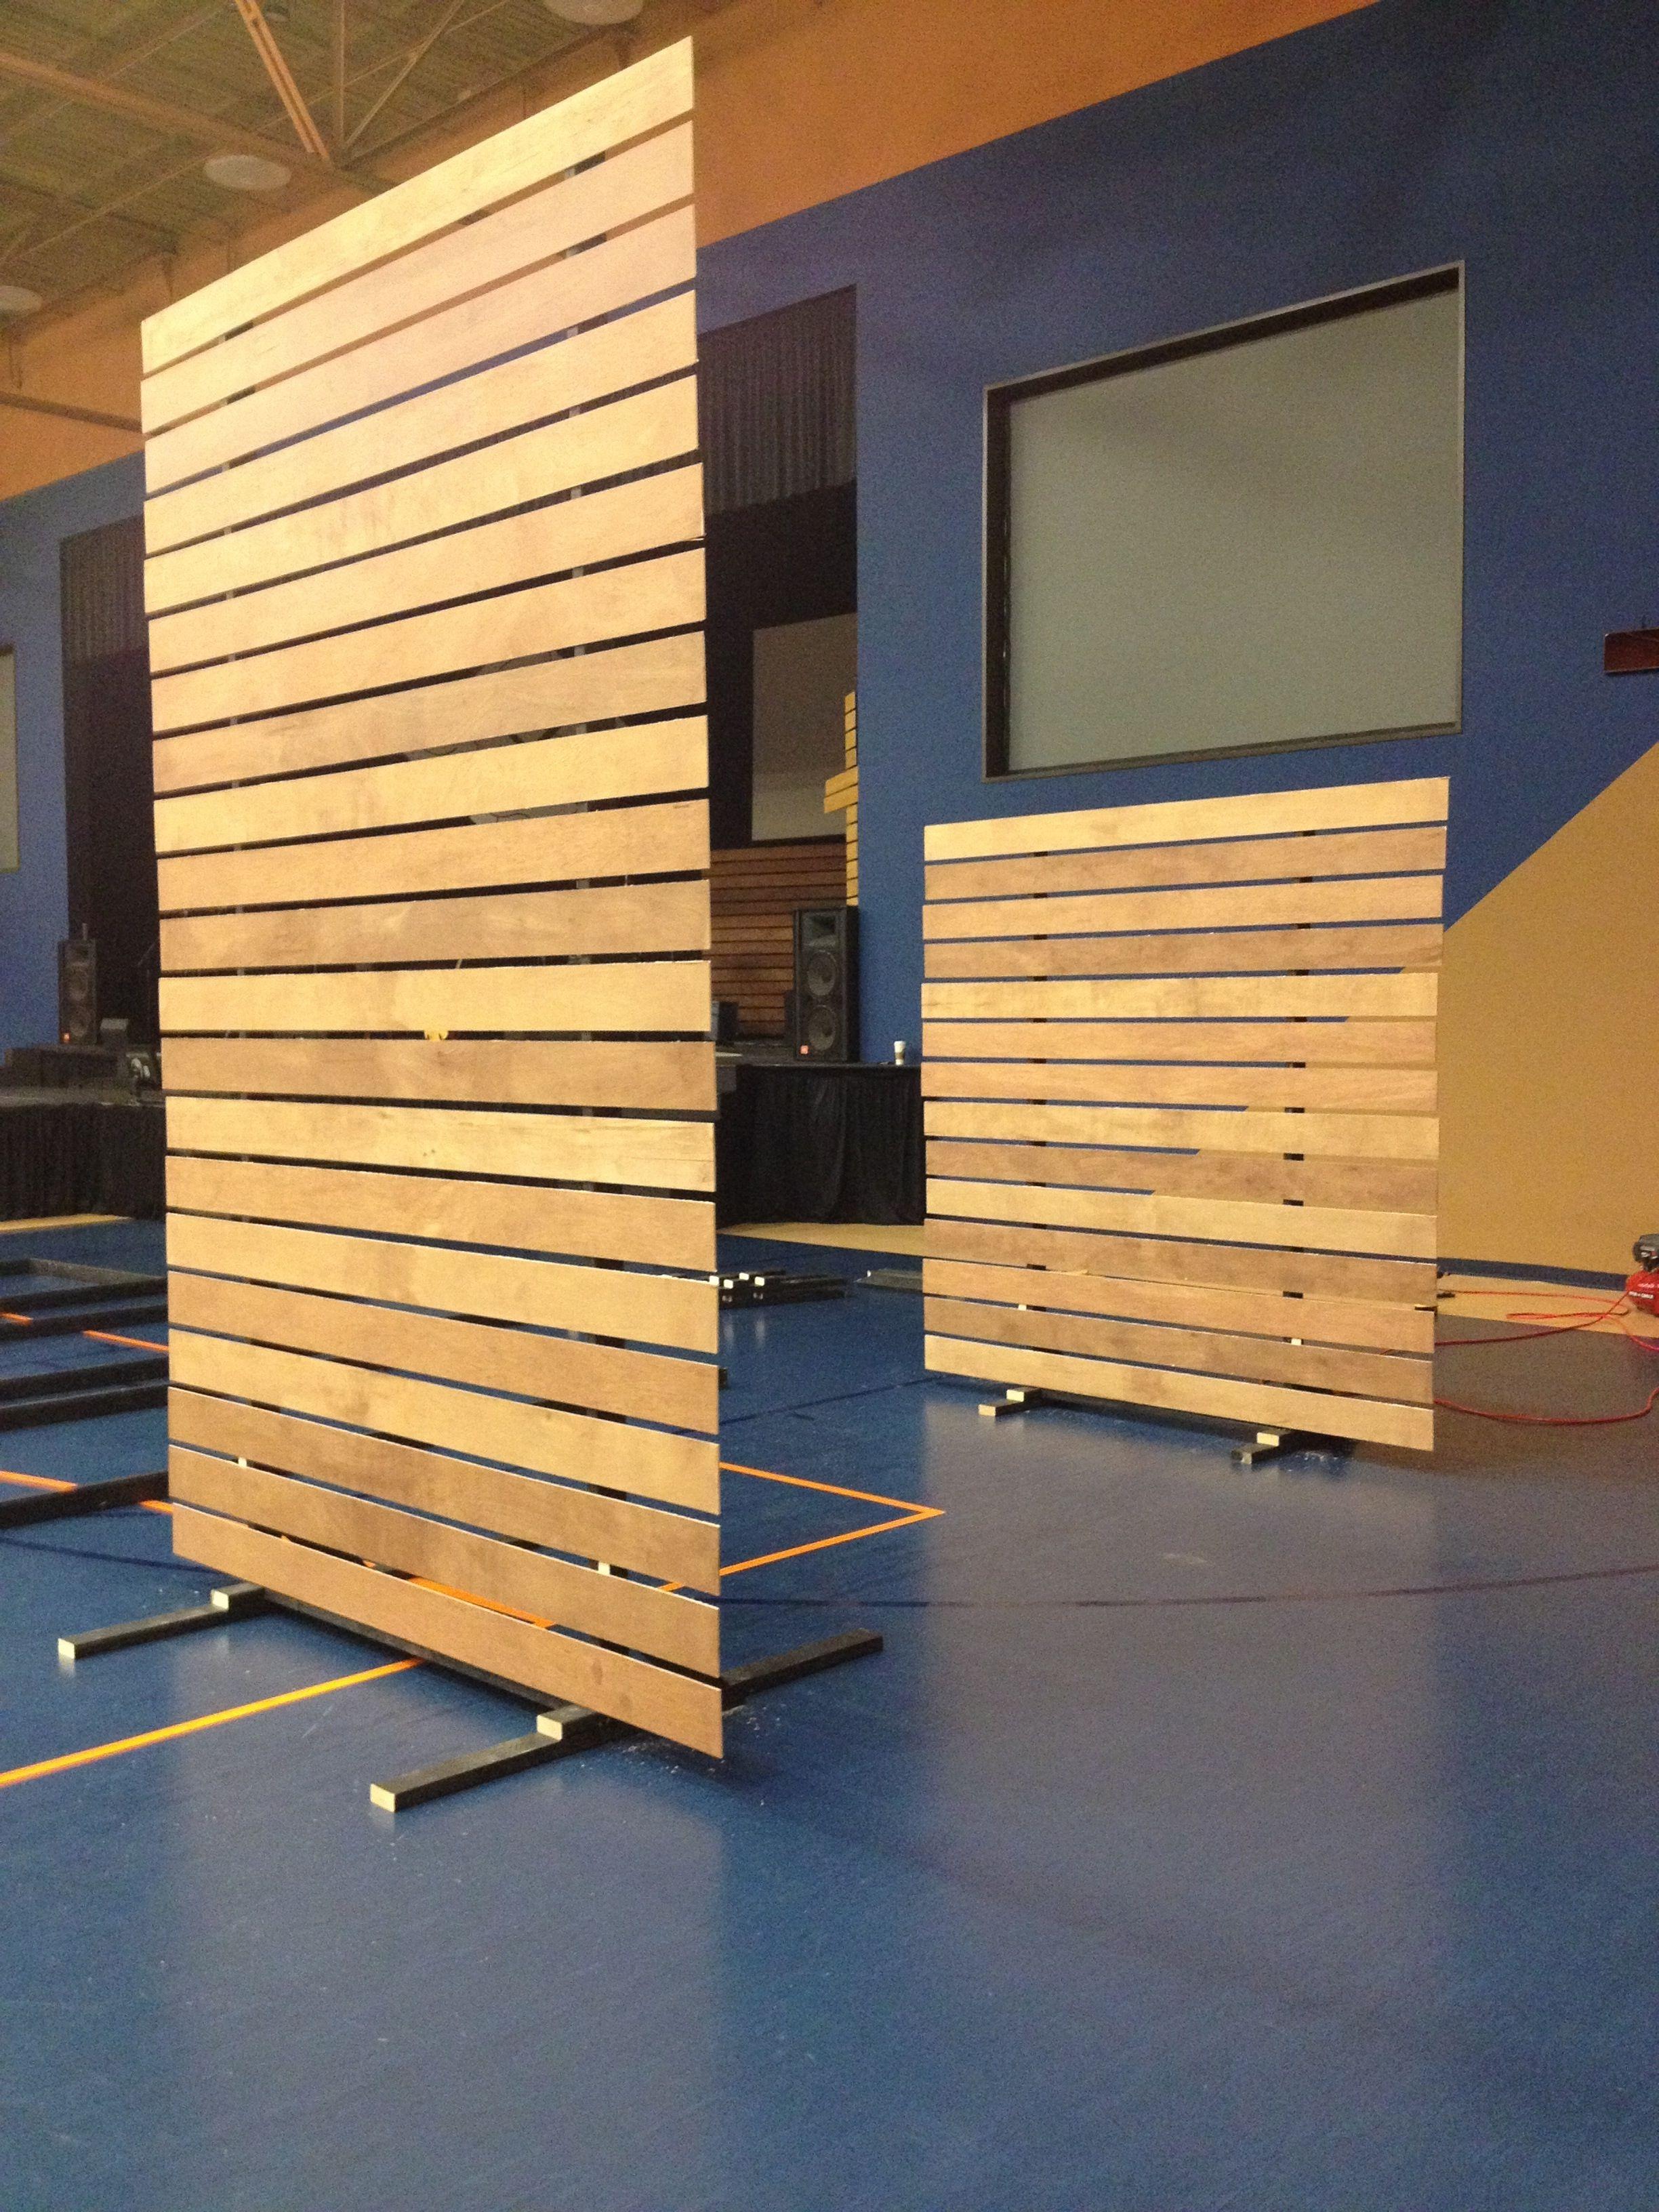 Phenomenal One Panel Room Divider Ideas On Foter Download Free Architecture Designs Scobabritishbridgeorg